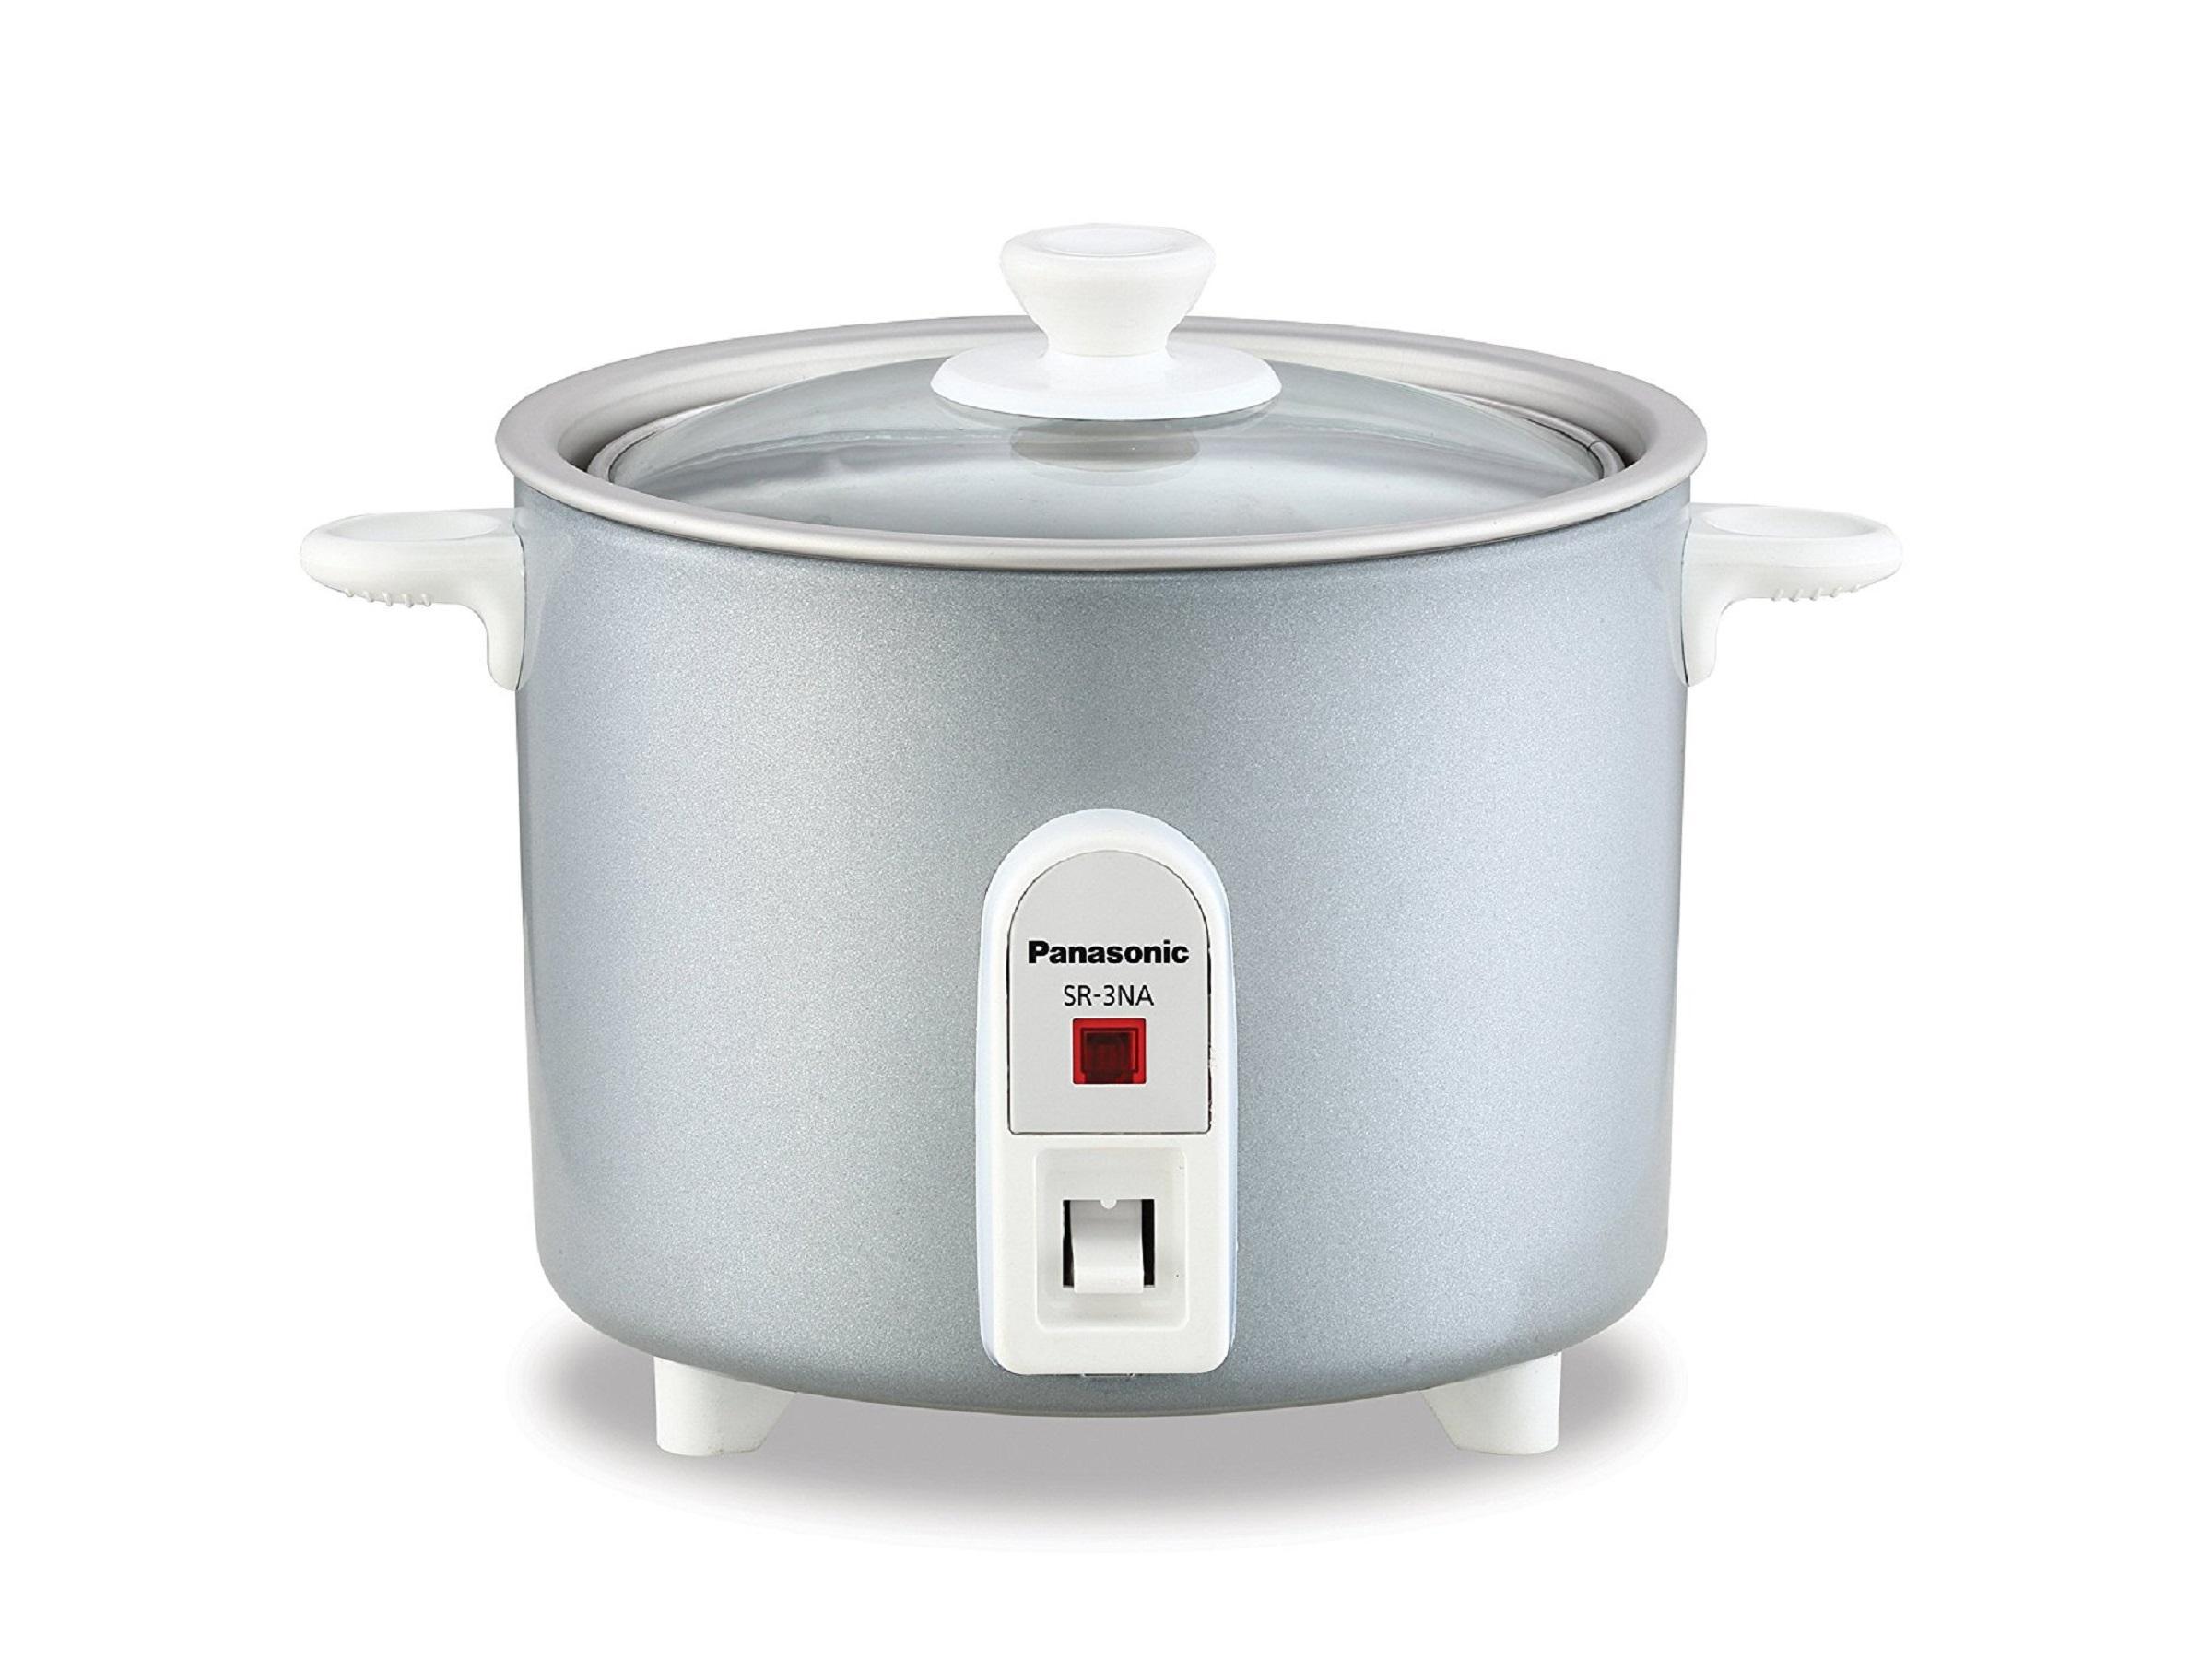 Test Kitchen Rice Cooker